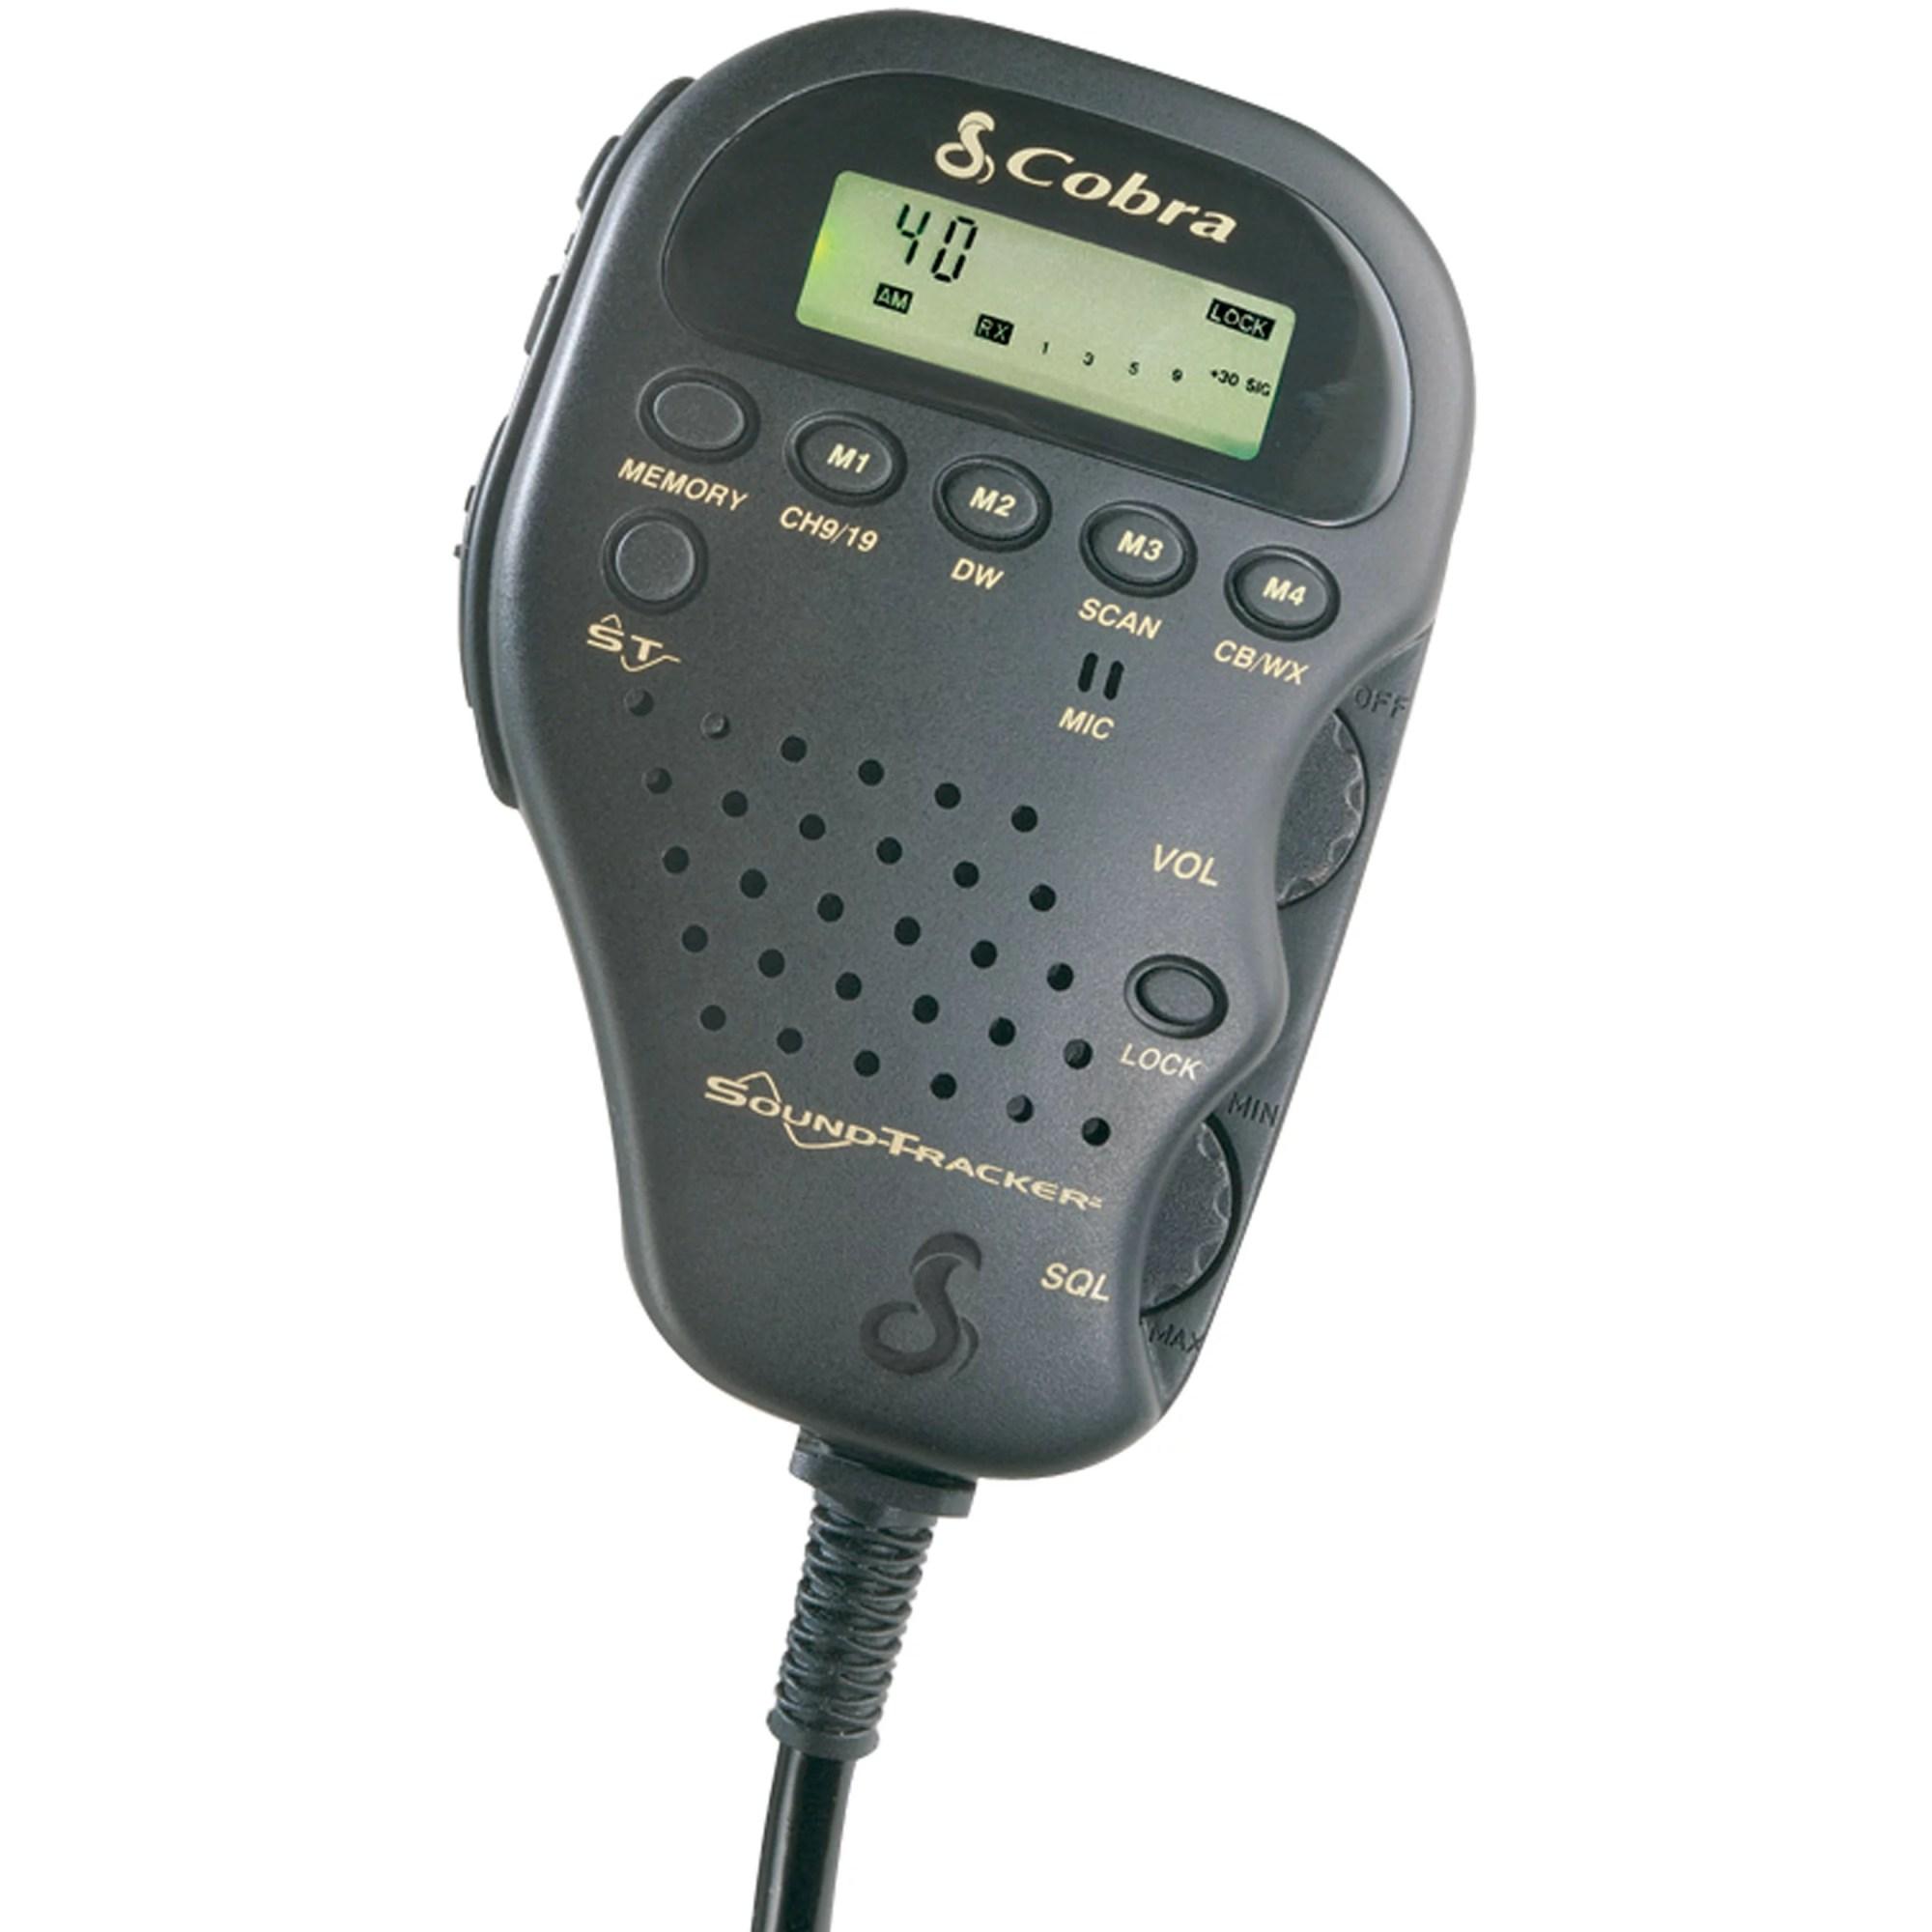 hight resolution of cobra electronics corporation 75 wx st radio cb remote 75 wx st walmart com